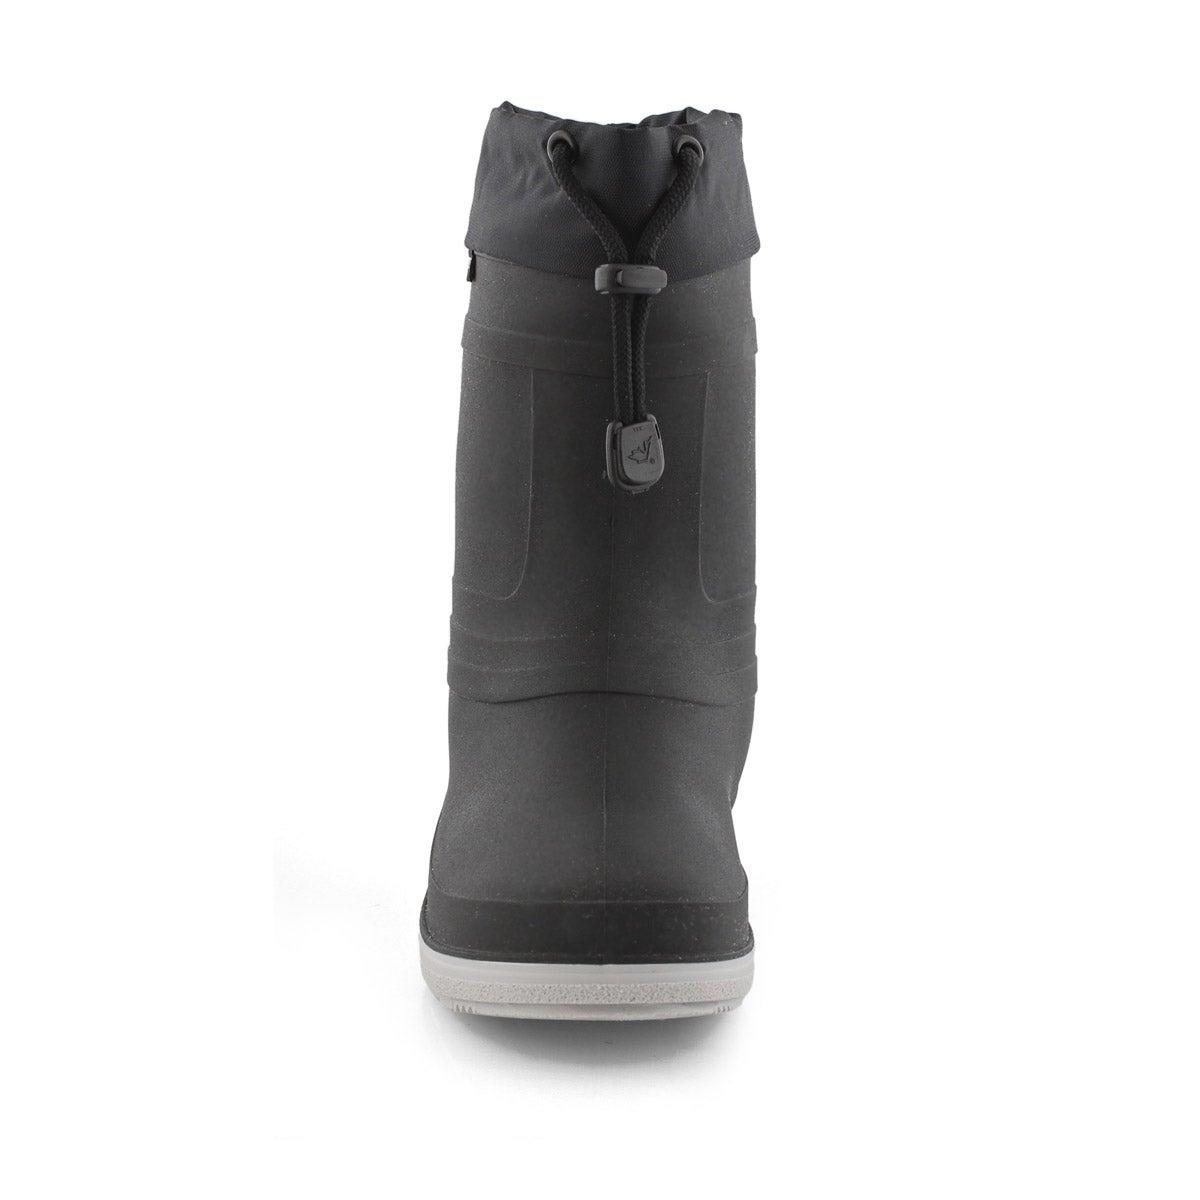 Kds Ice Castle black wtpf winter boot